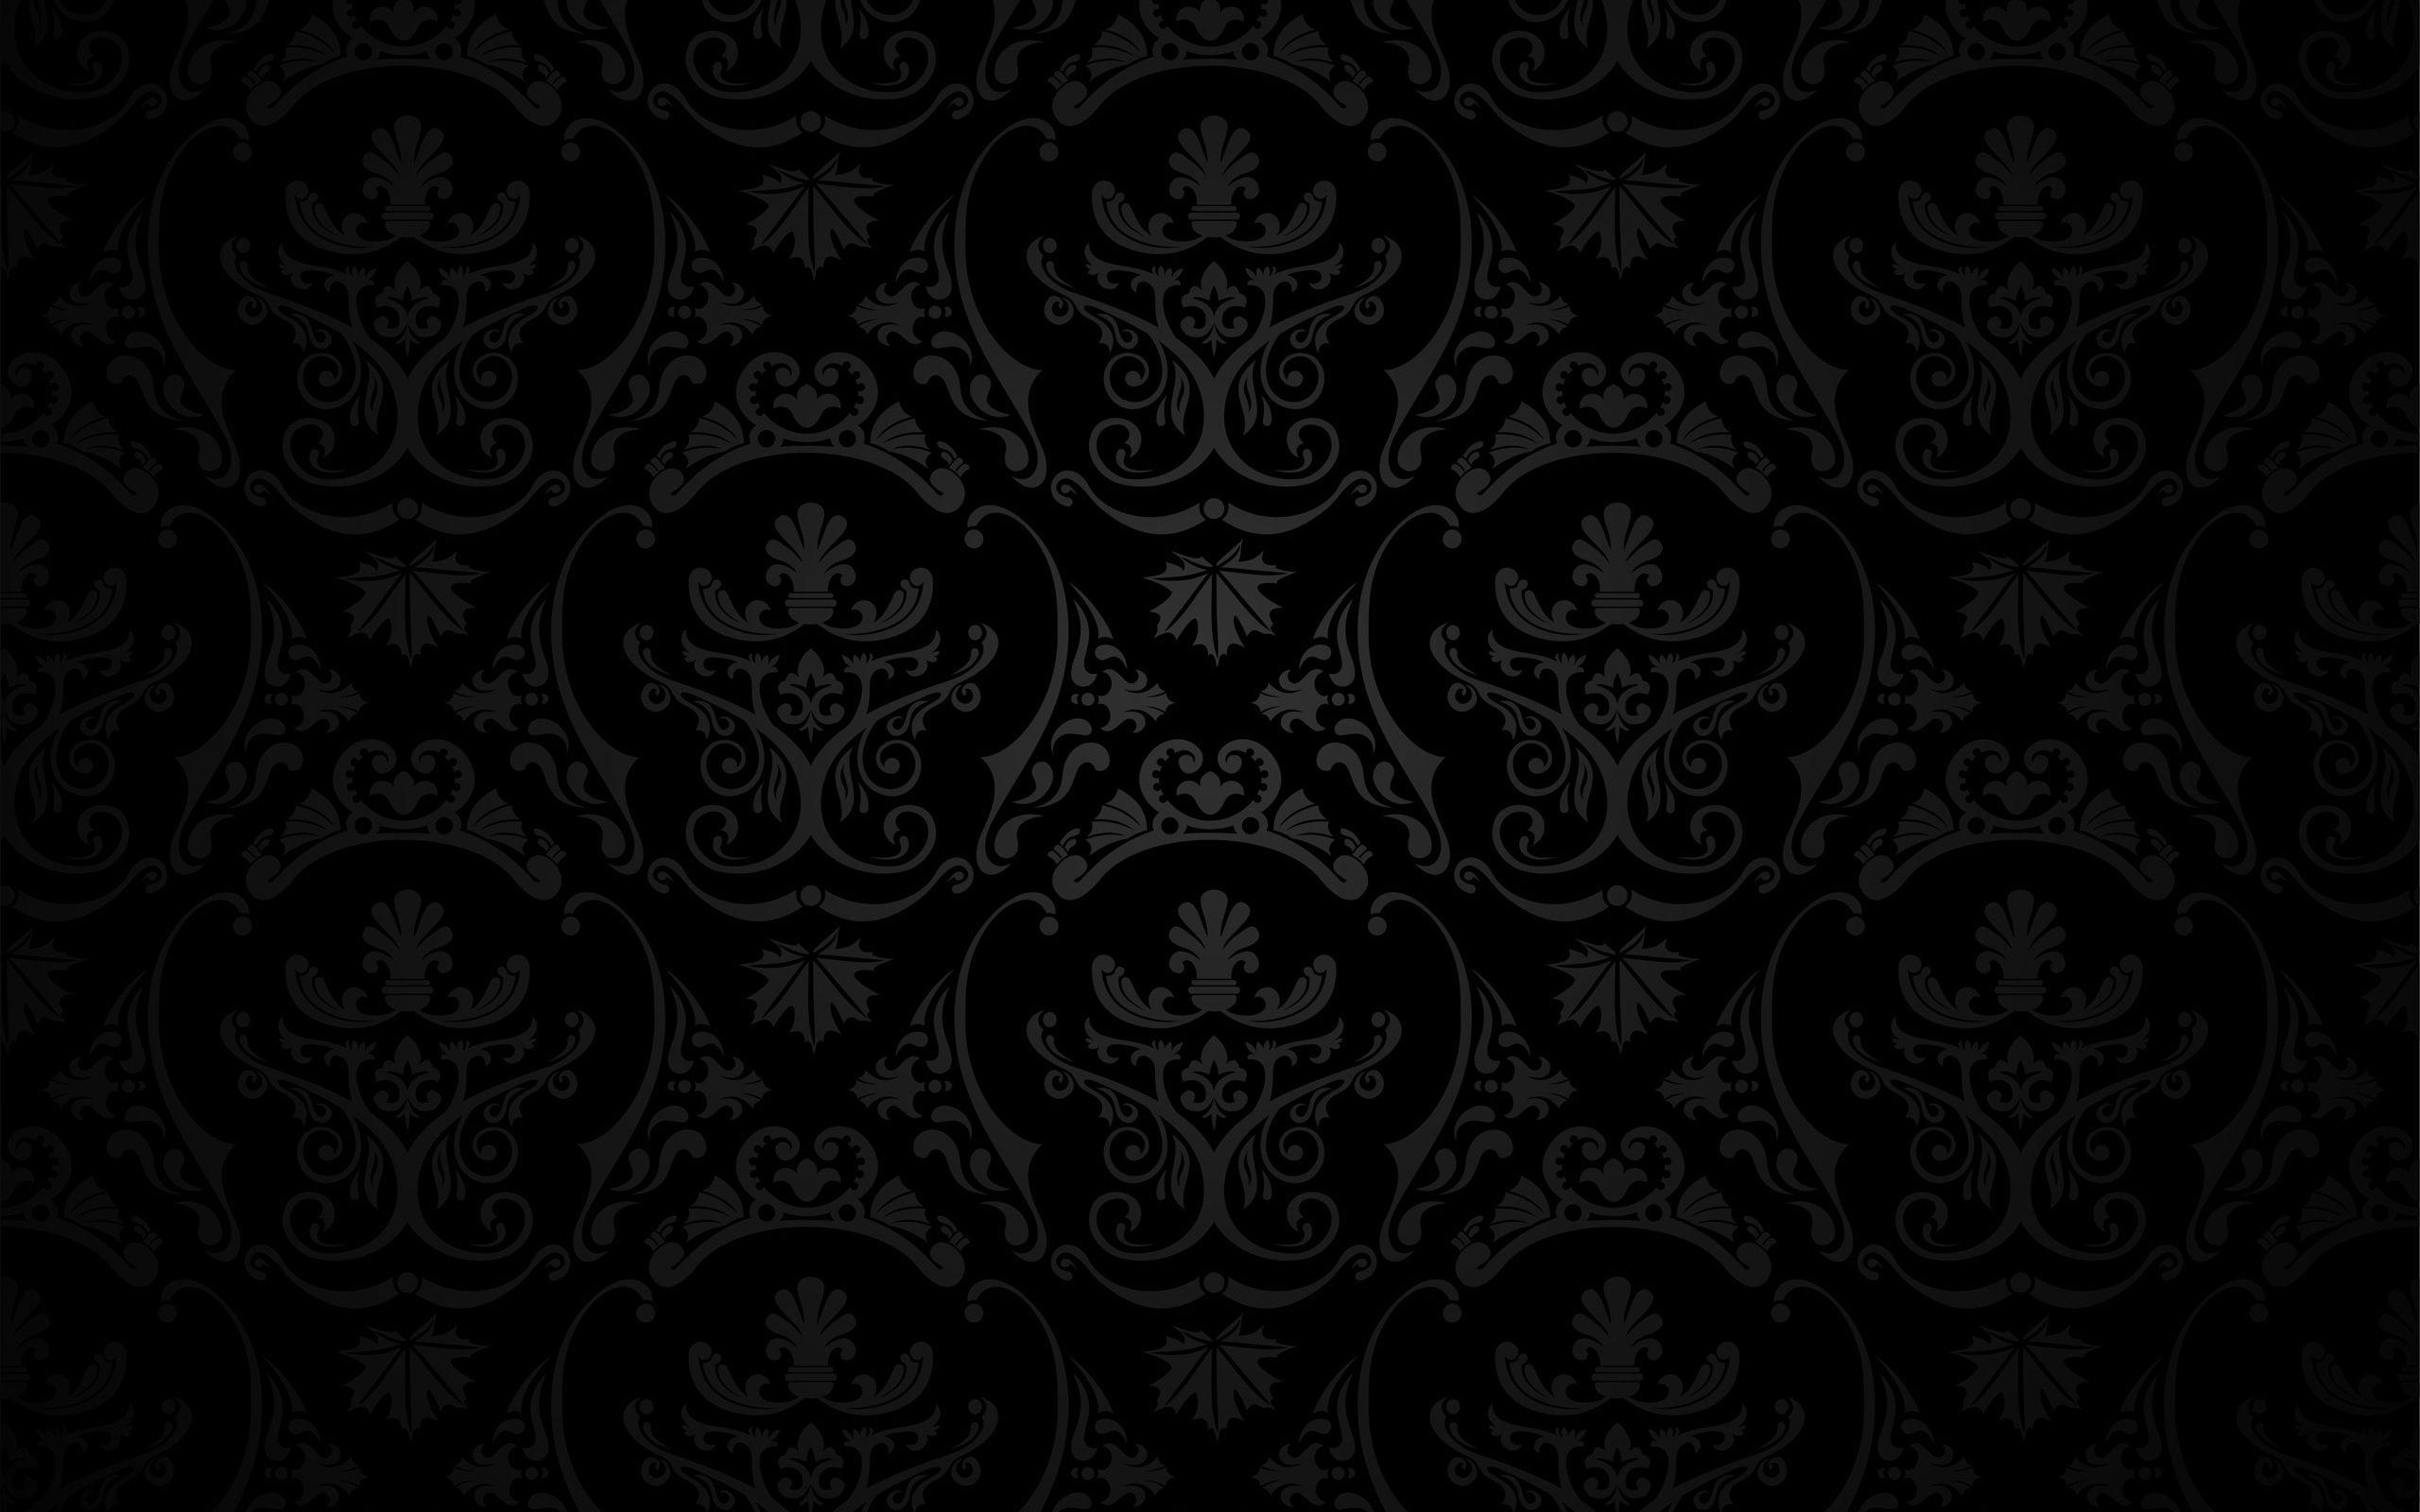 Background image black - Black Pattern Google Suche Black Patterns Pinterest Wallpaper Hd Wallpaper And Screensaver